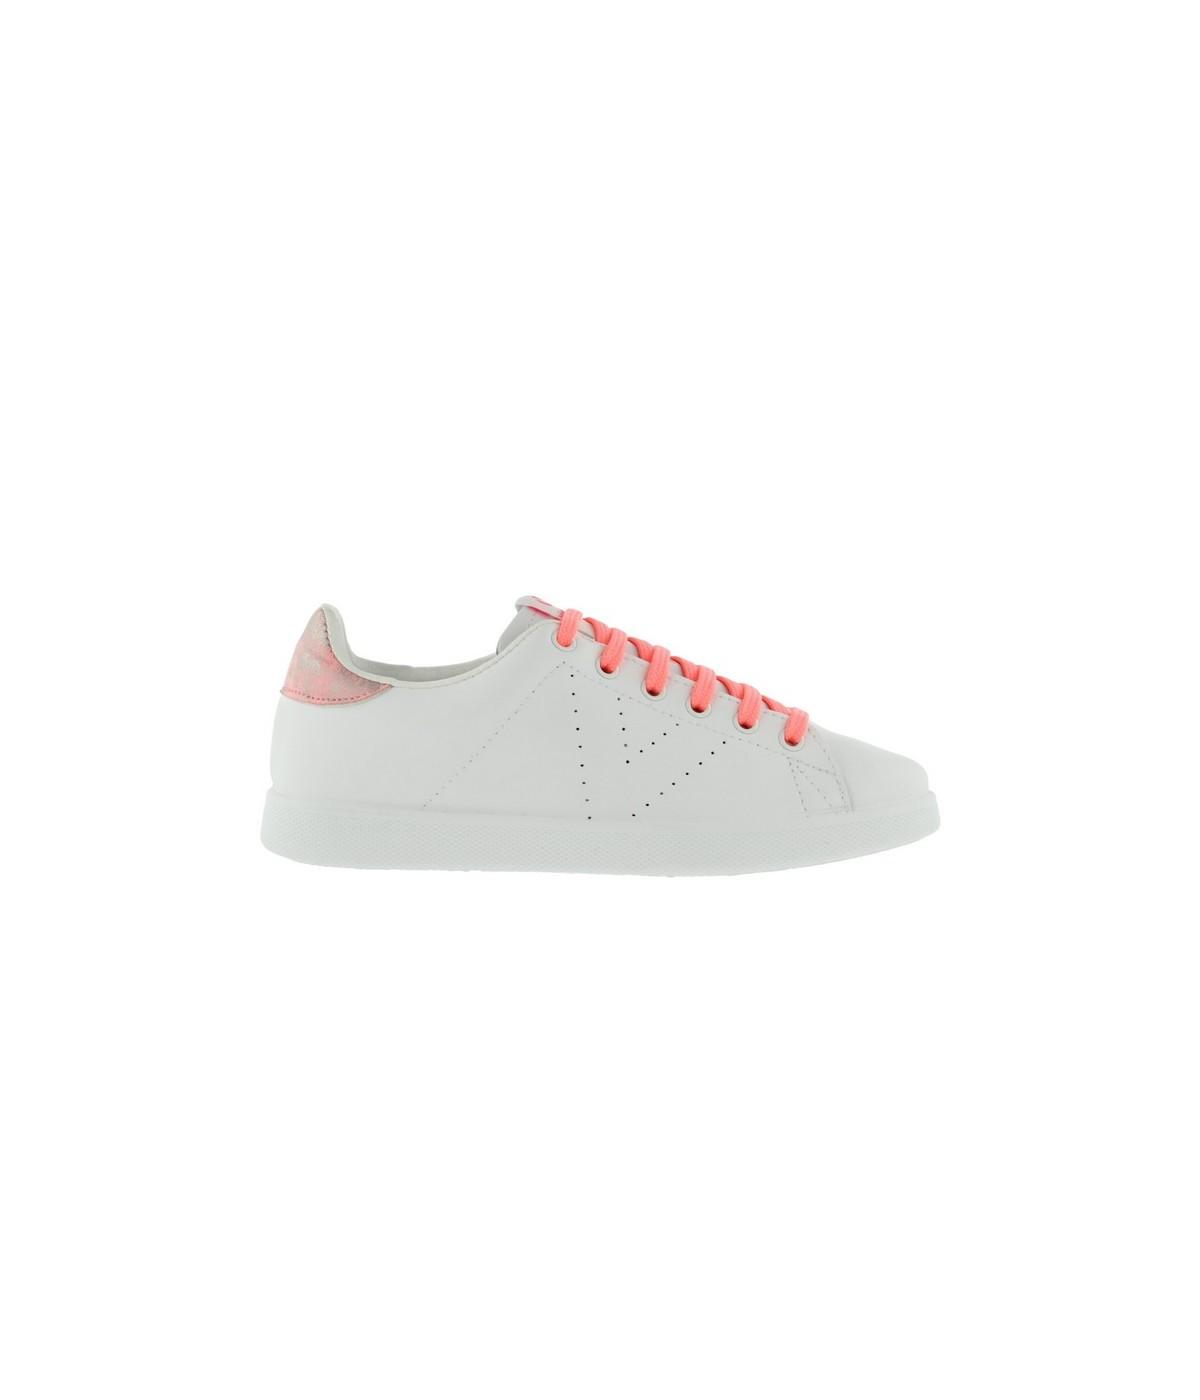 Basket Femme Victoria 1125203 Blanc et Flash Corail | SHOWROOMVIP : Baskets basses Femme